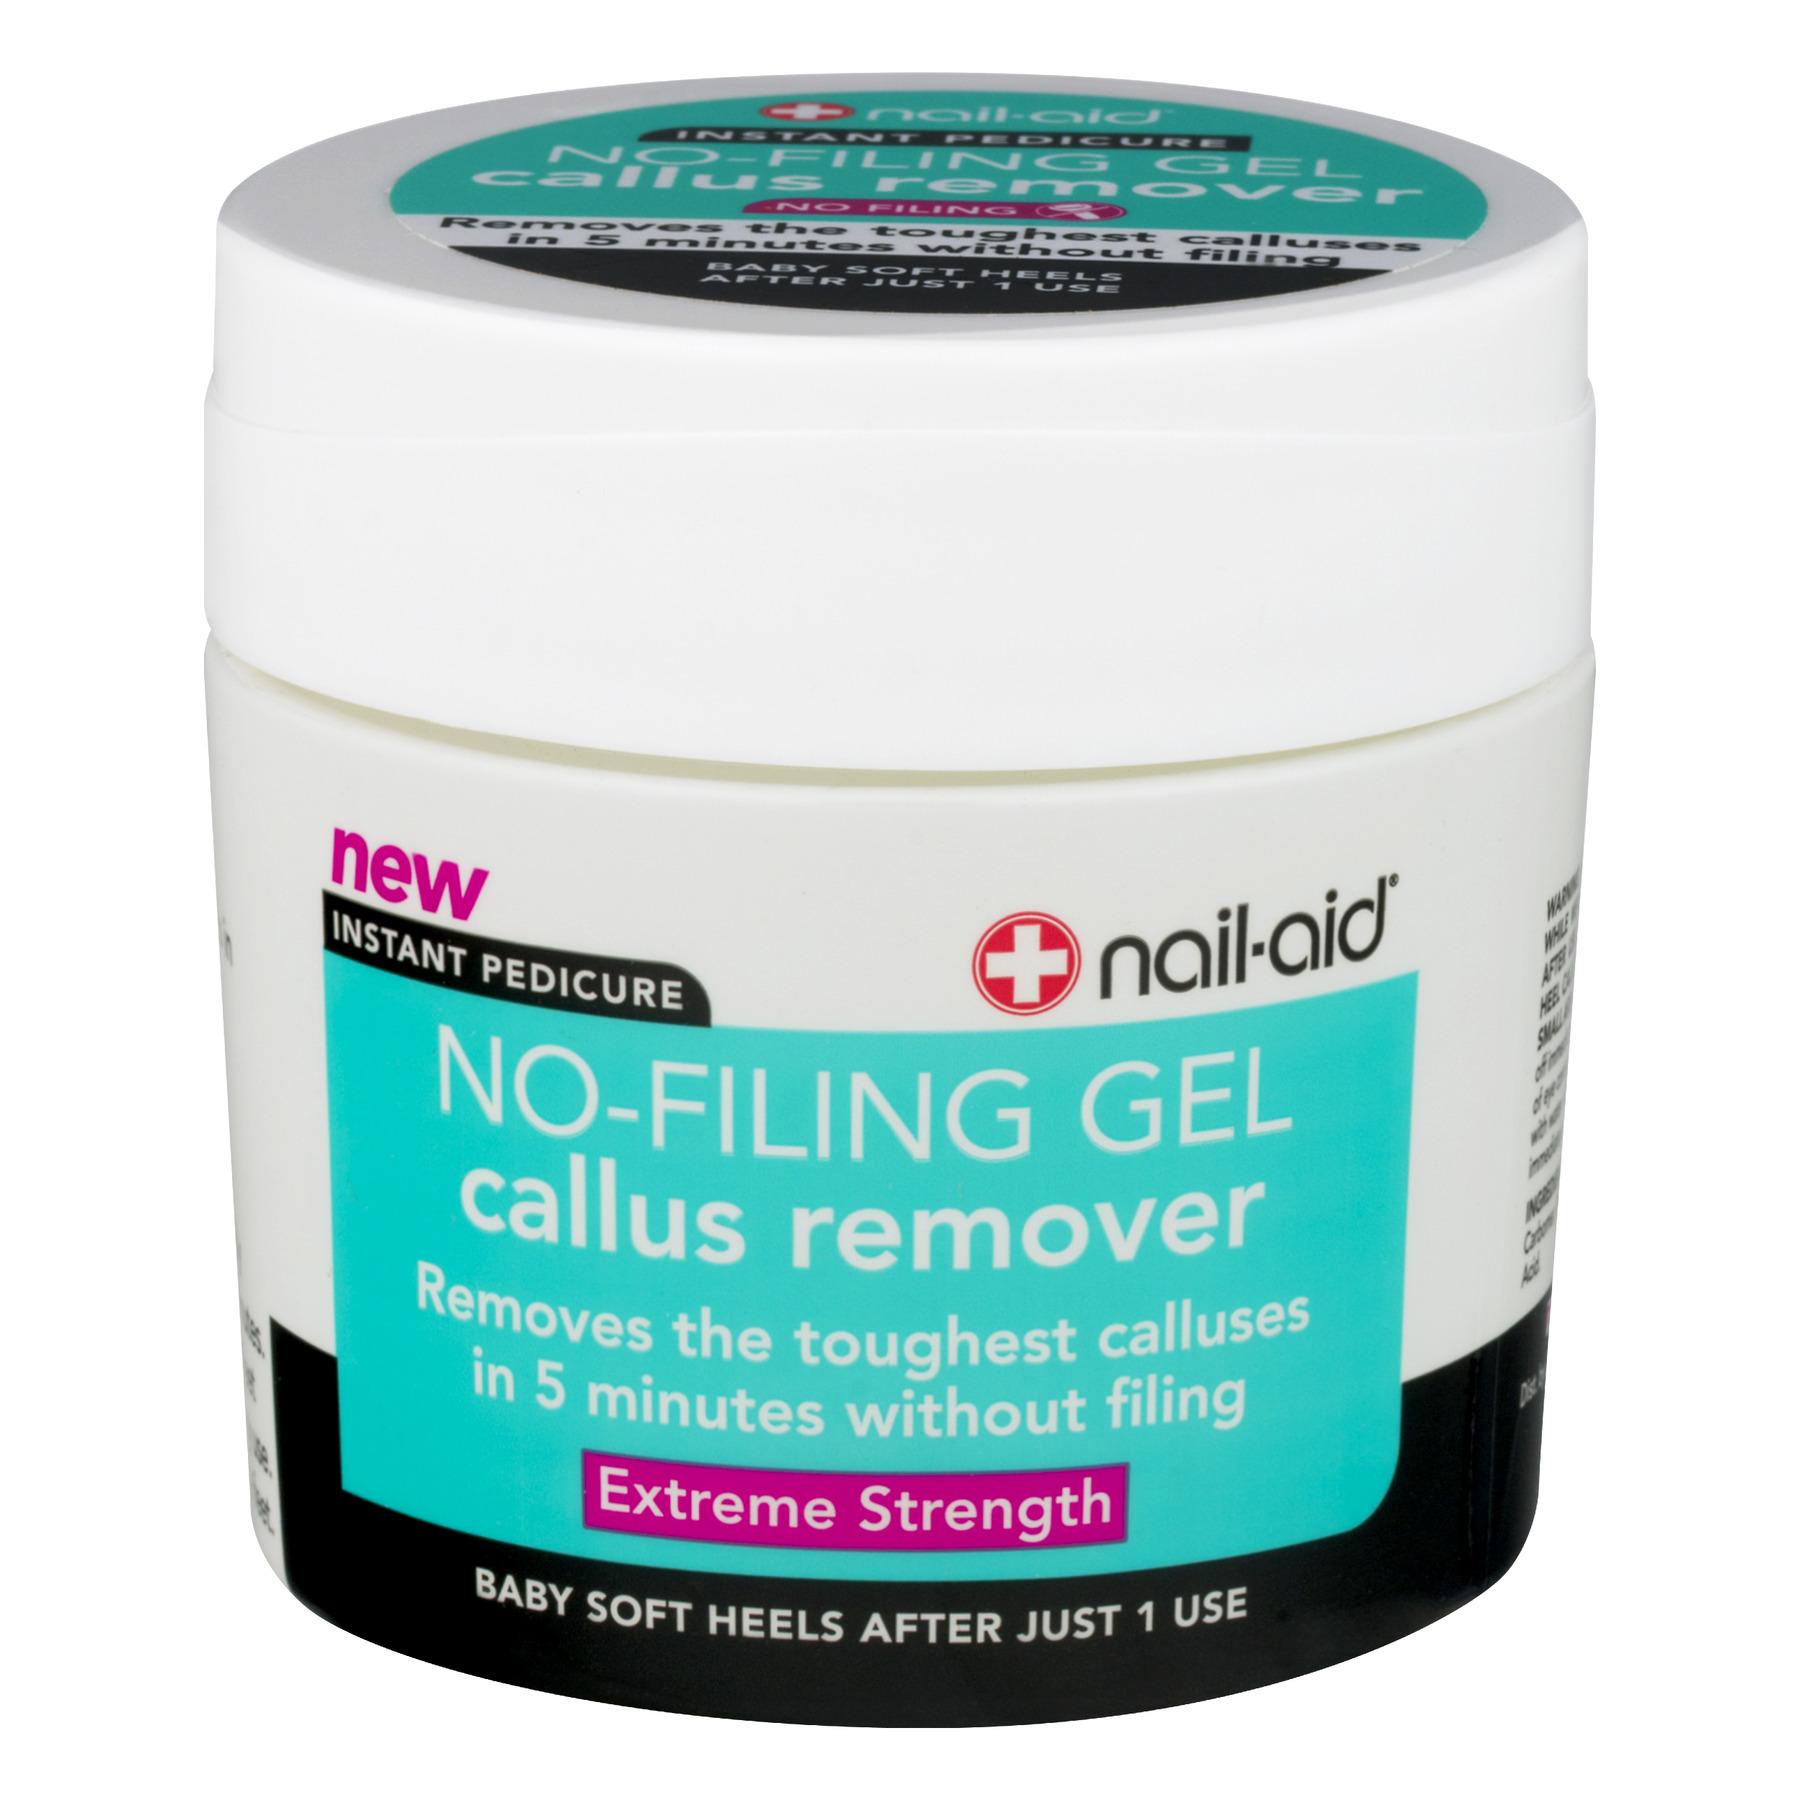 Nail-Aid No-Filing Gel Callus Remover, 5.5 OZ